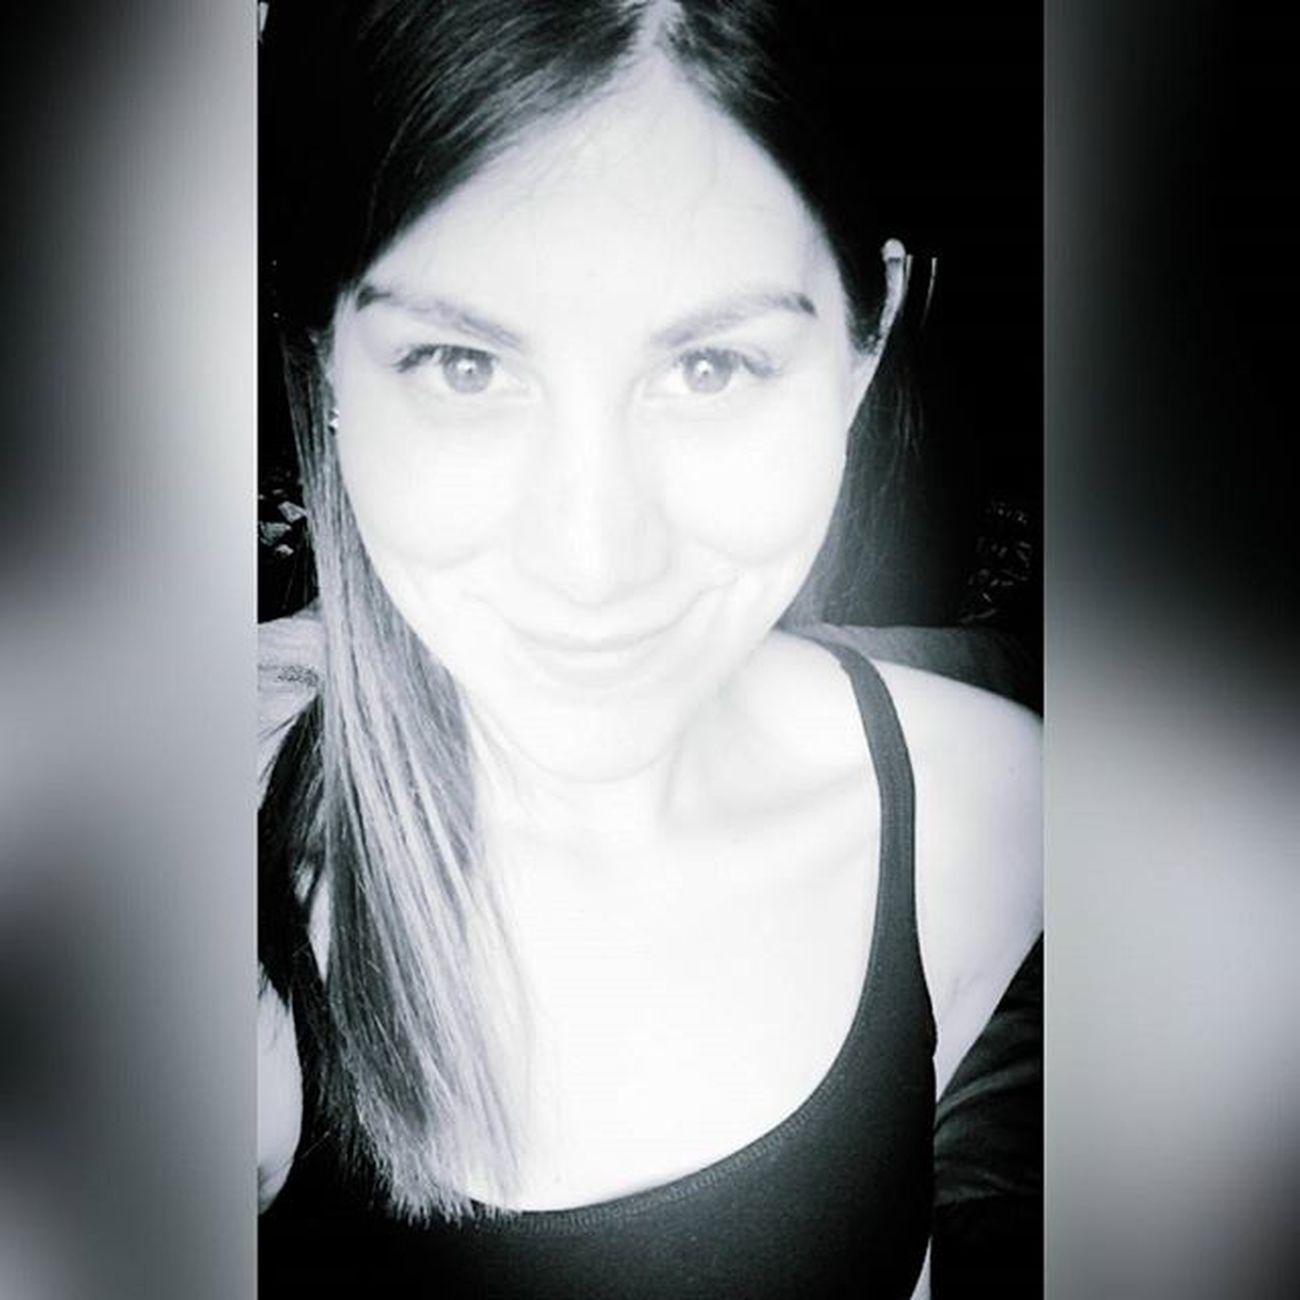 Mucha fe. Instarelax Instamoment Instagood Instadaily Chile Chilegram Chilena Photooftheday Picoftheday Love Me L4l Live Like Whitegirl  Feliz Likeforlike